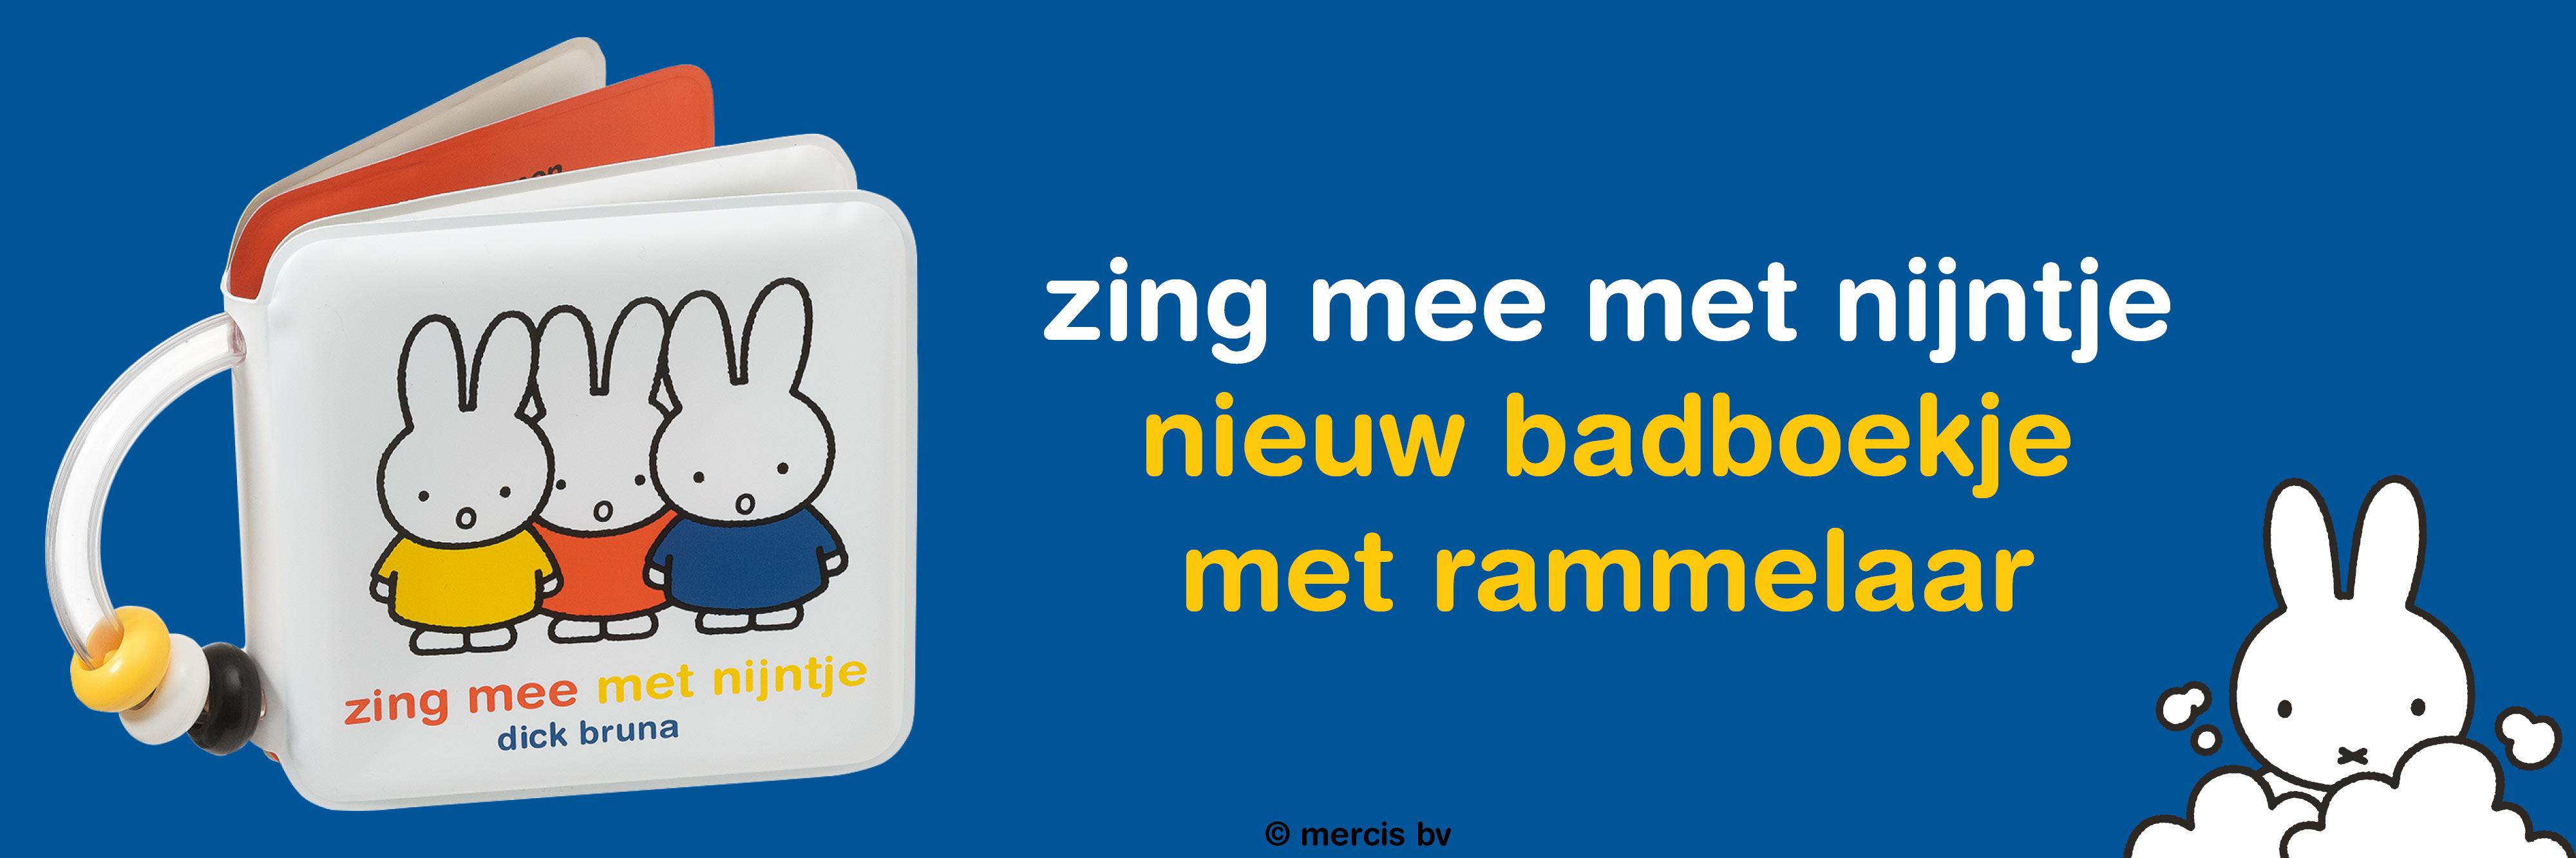 311454 banner zingmee 27a357 original 1556868411